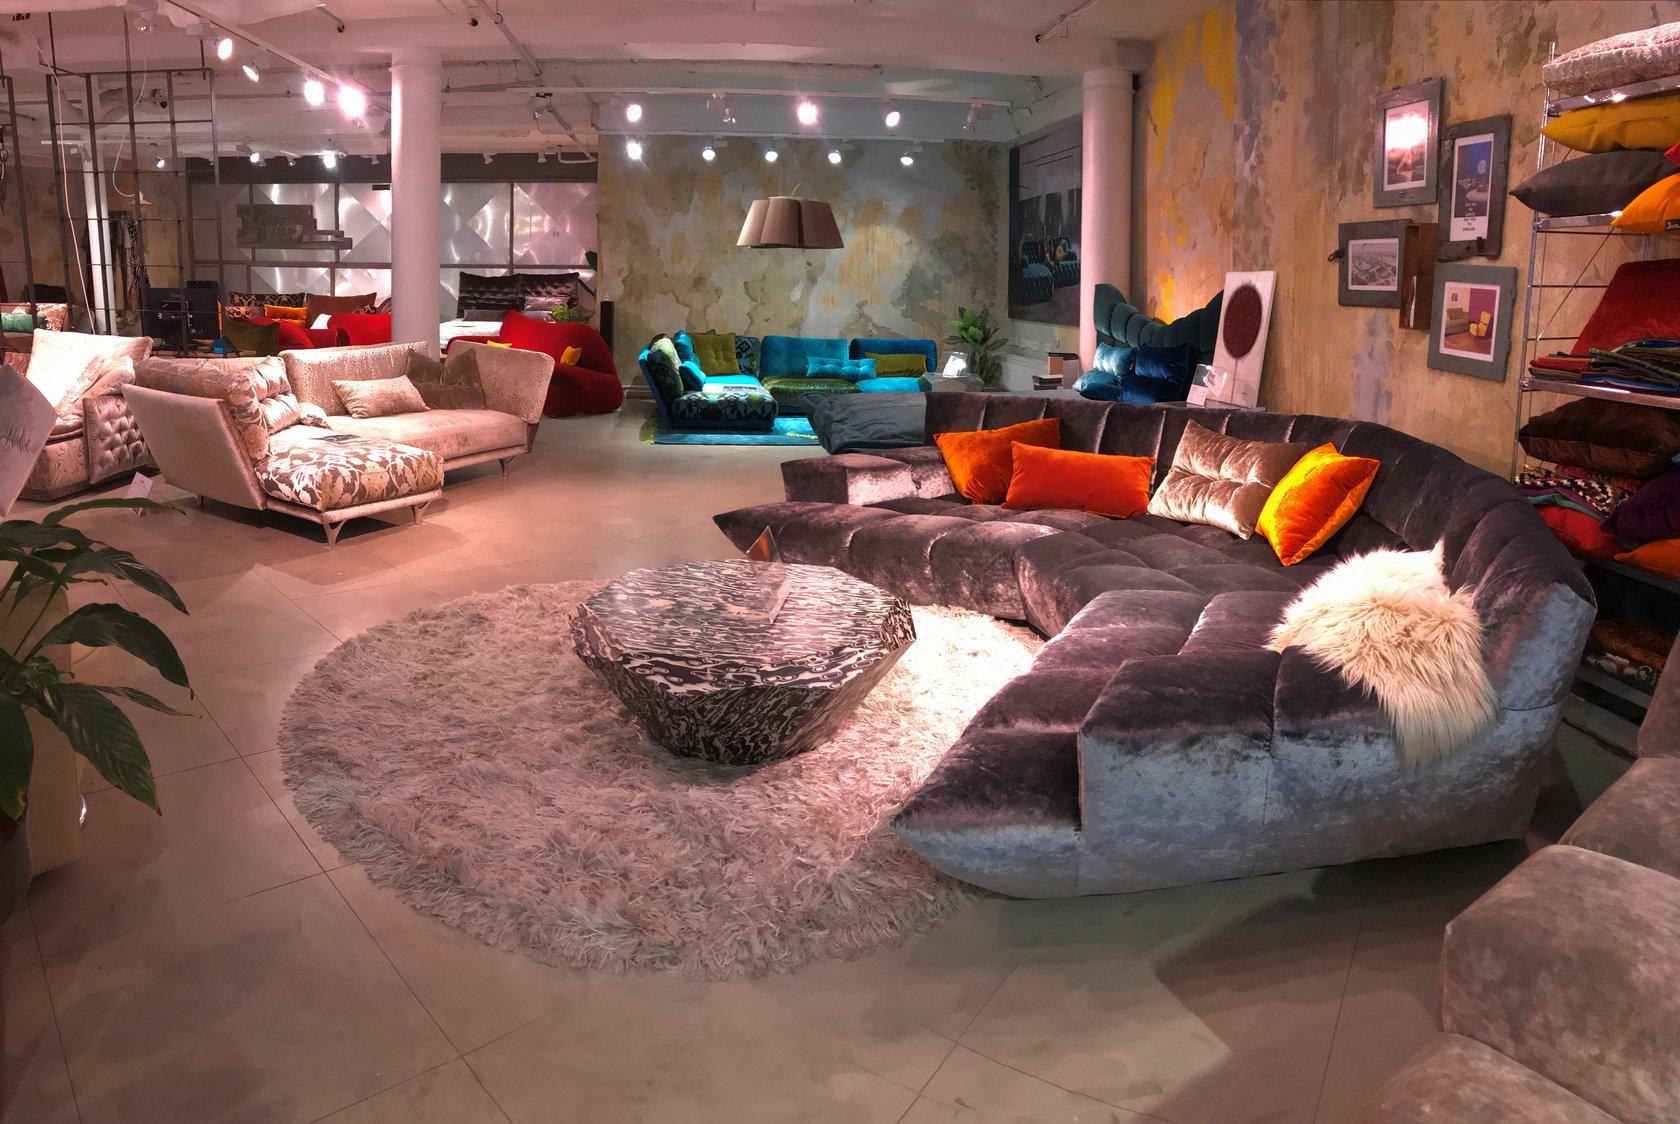 100 cloud 7 bretz bretz cloud 7 bett w154 200 200. Black Bedroom Furniture Sets. Home Design Ideas